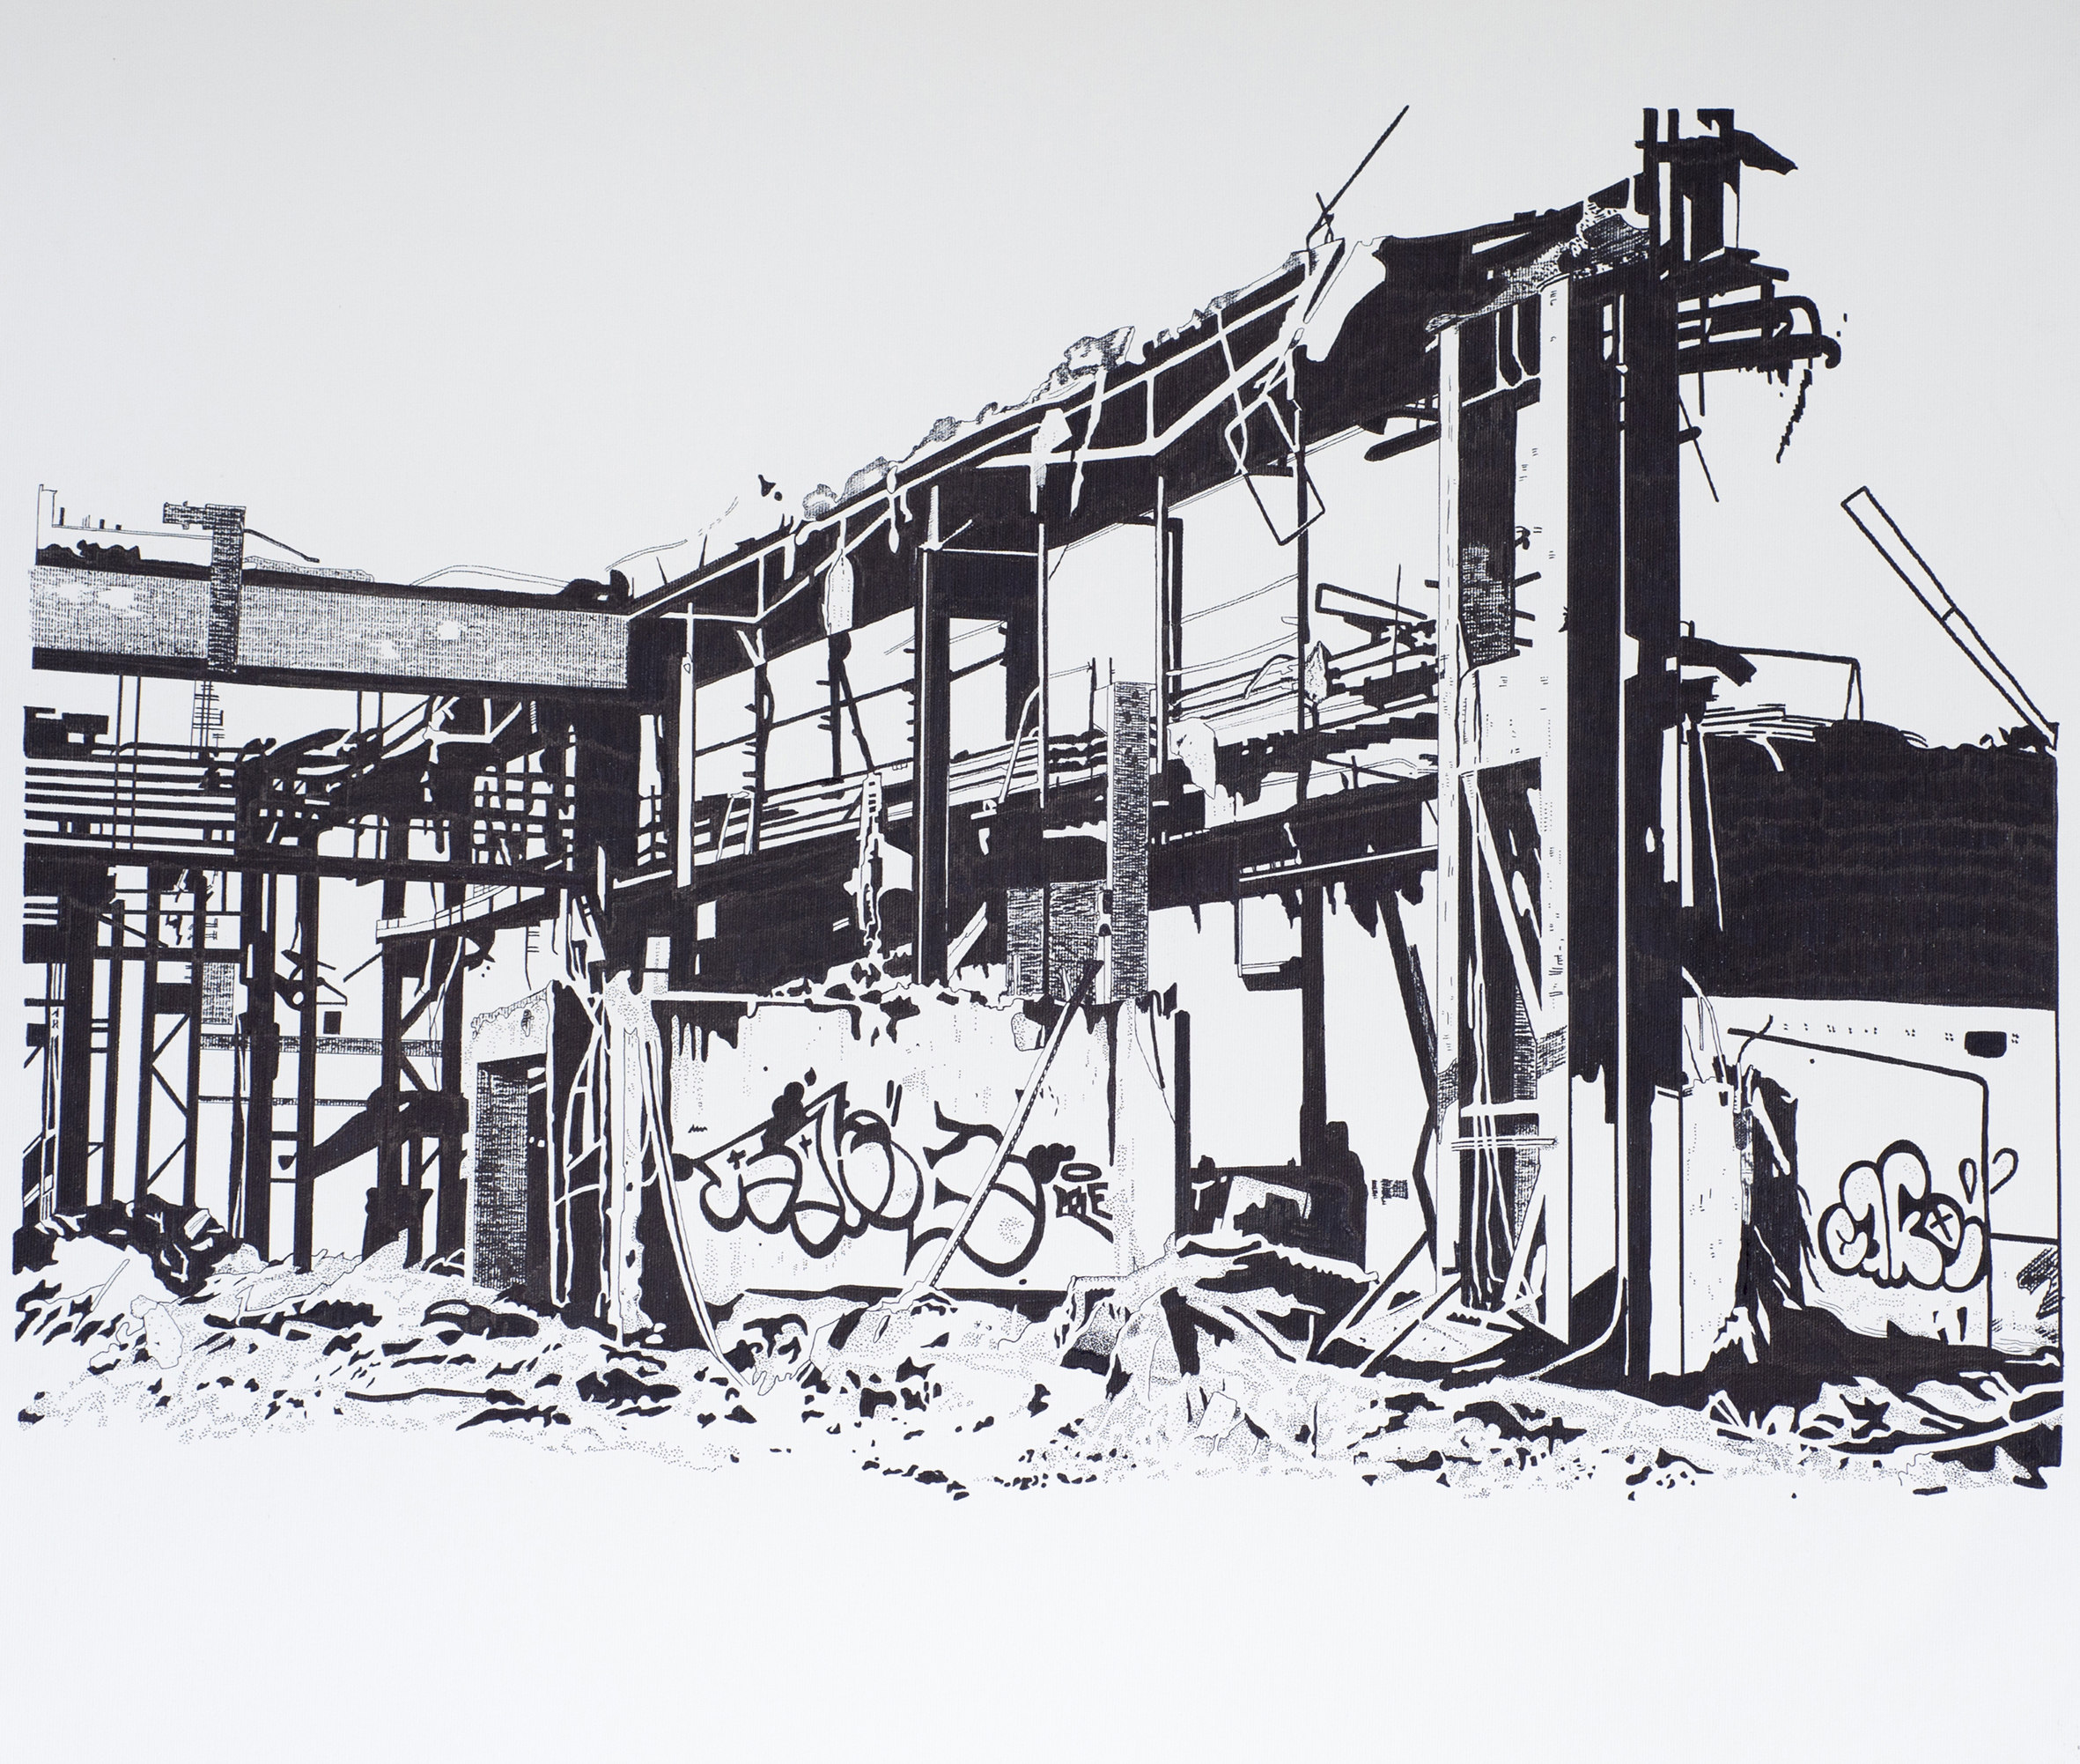 halle_1_g  permanent marker // canvas 100cm x 82.5cm (frame) 2015